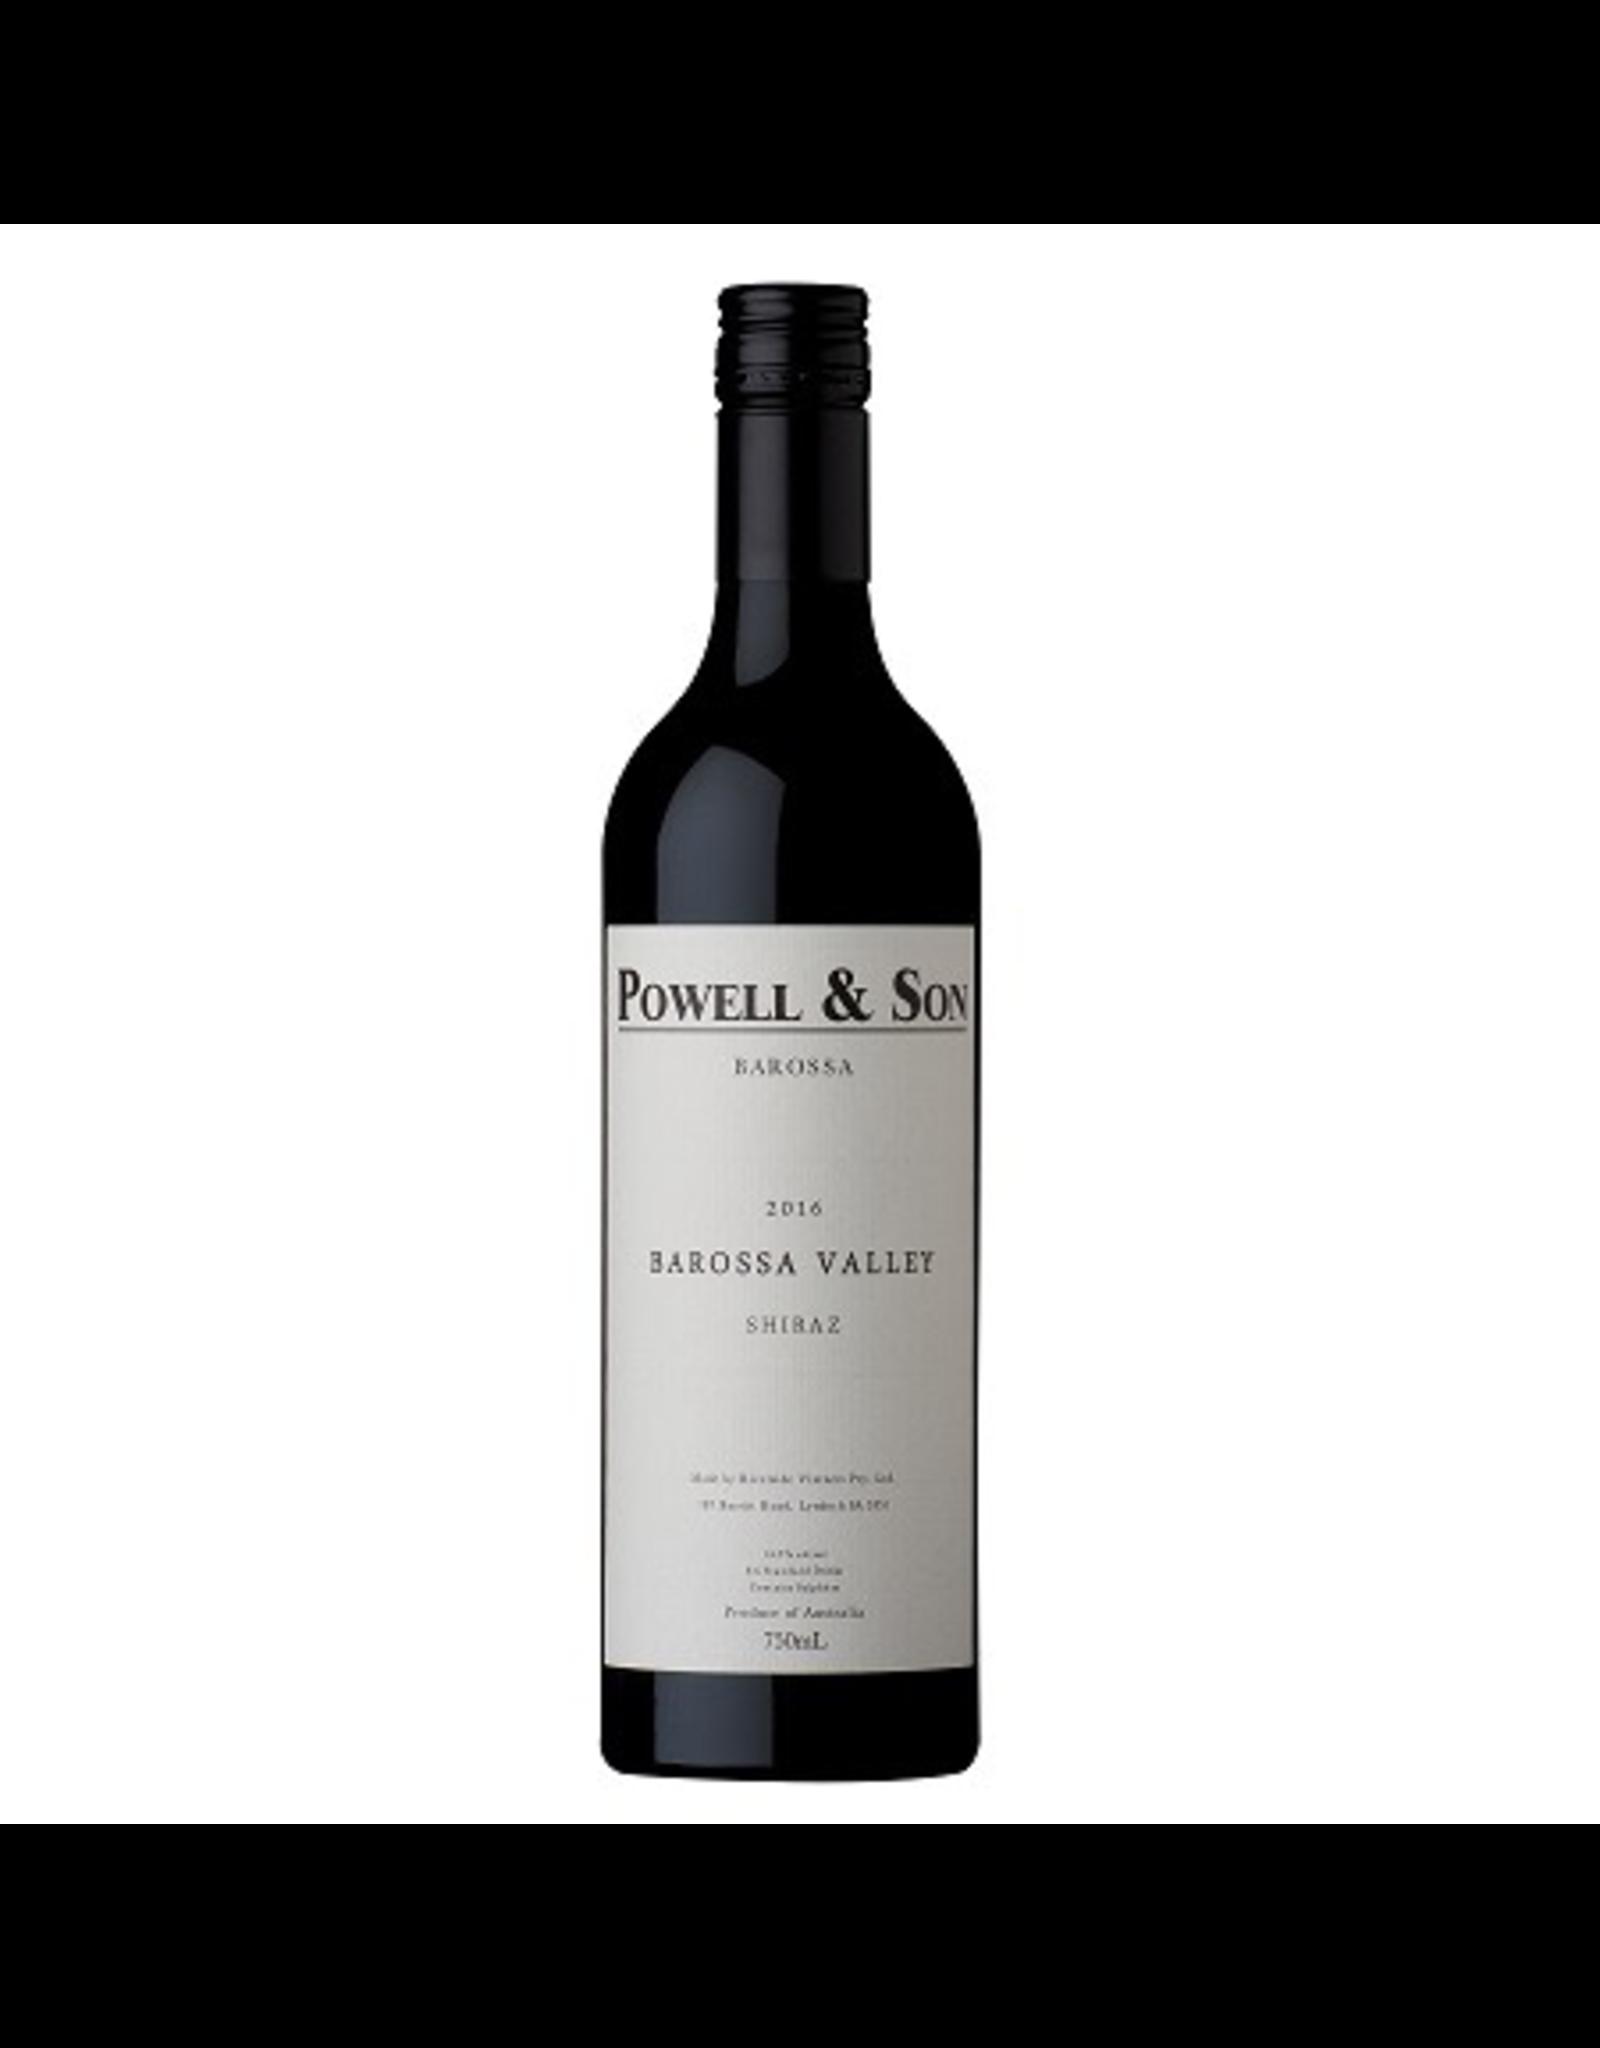 Red Wine 2016, Powell & Son, Shiraz, Barossa Valley, Barossa, Australia, 14.5% Alc, CTnr, TW93